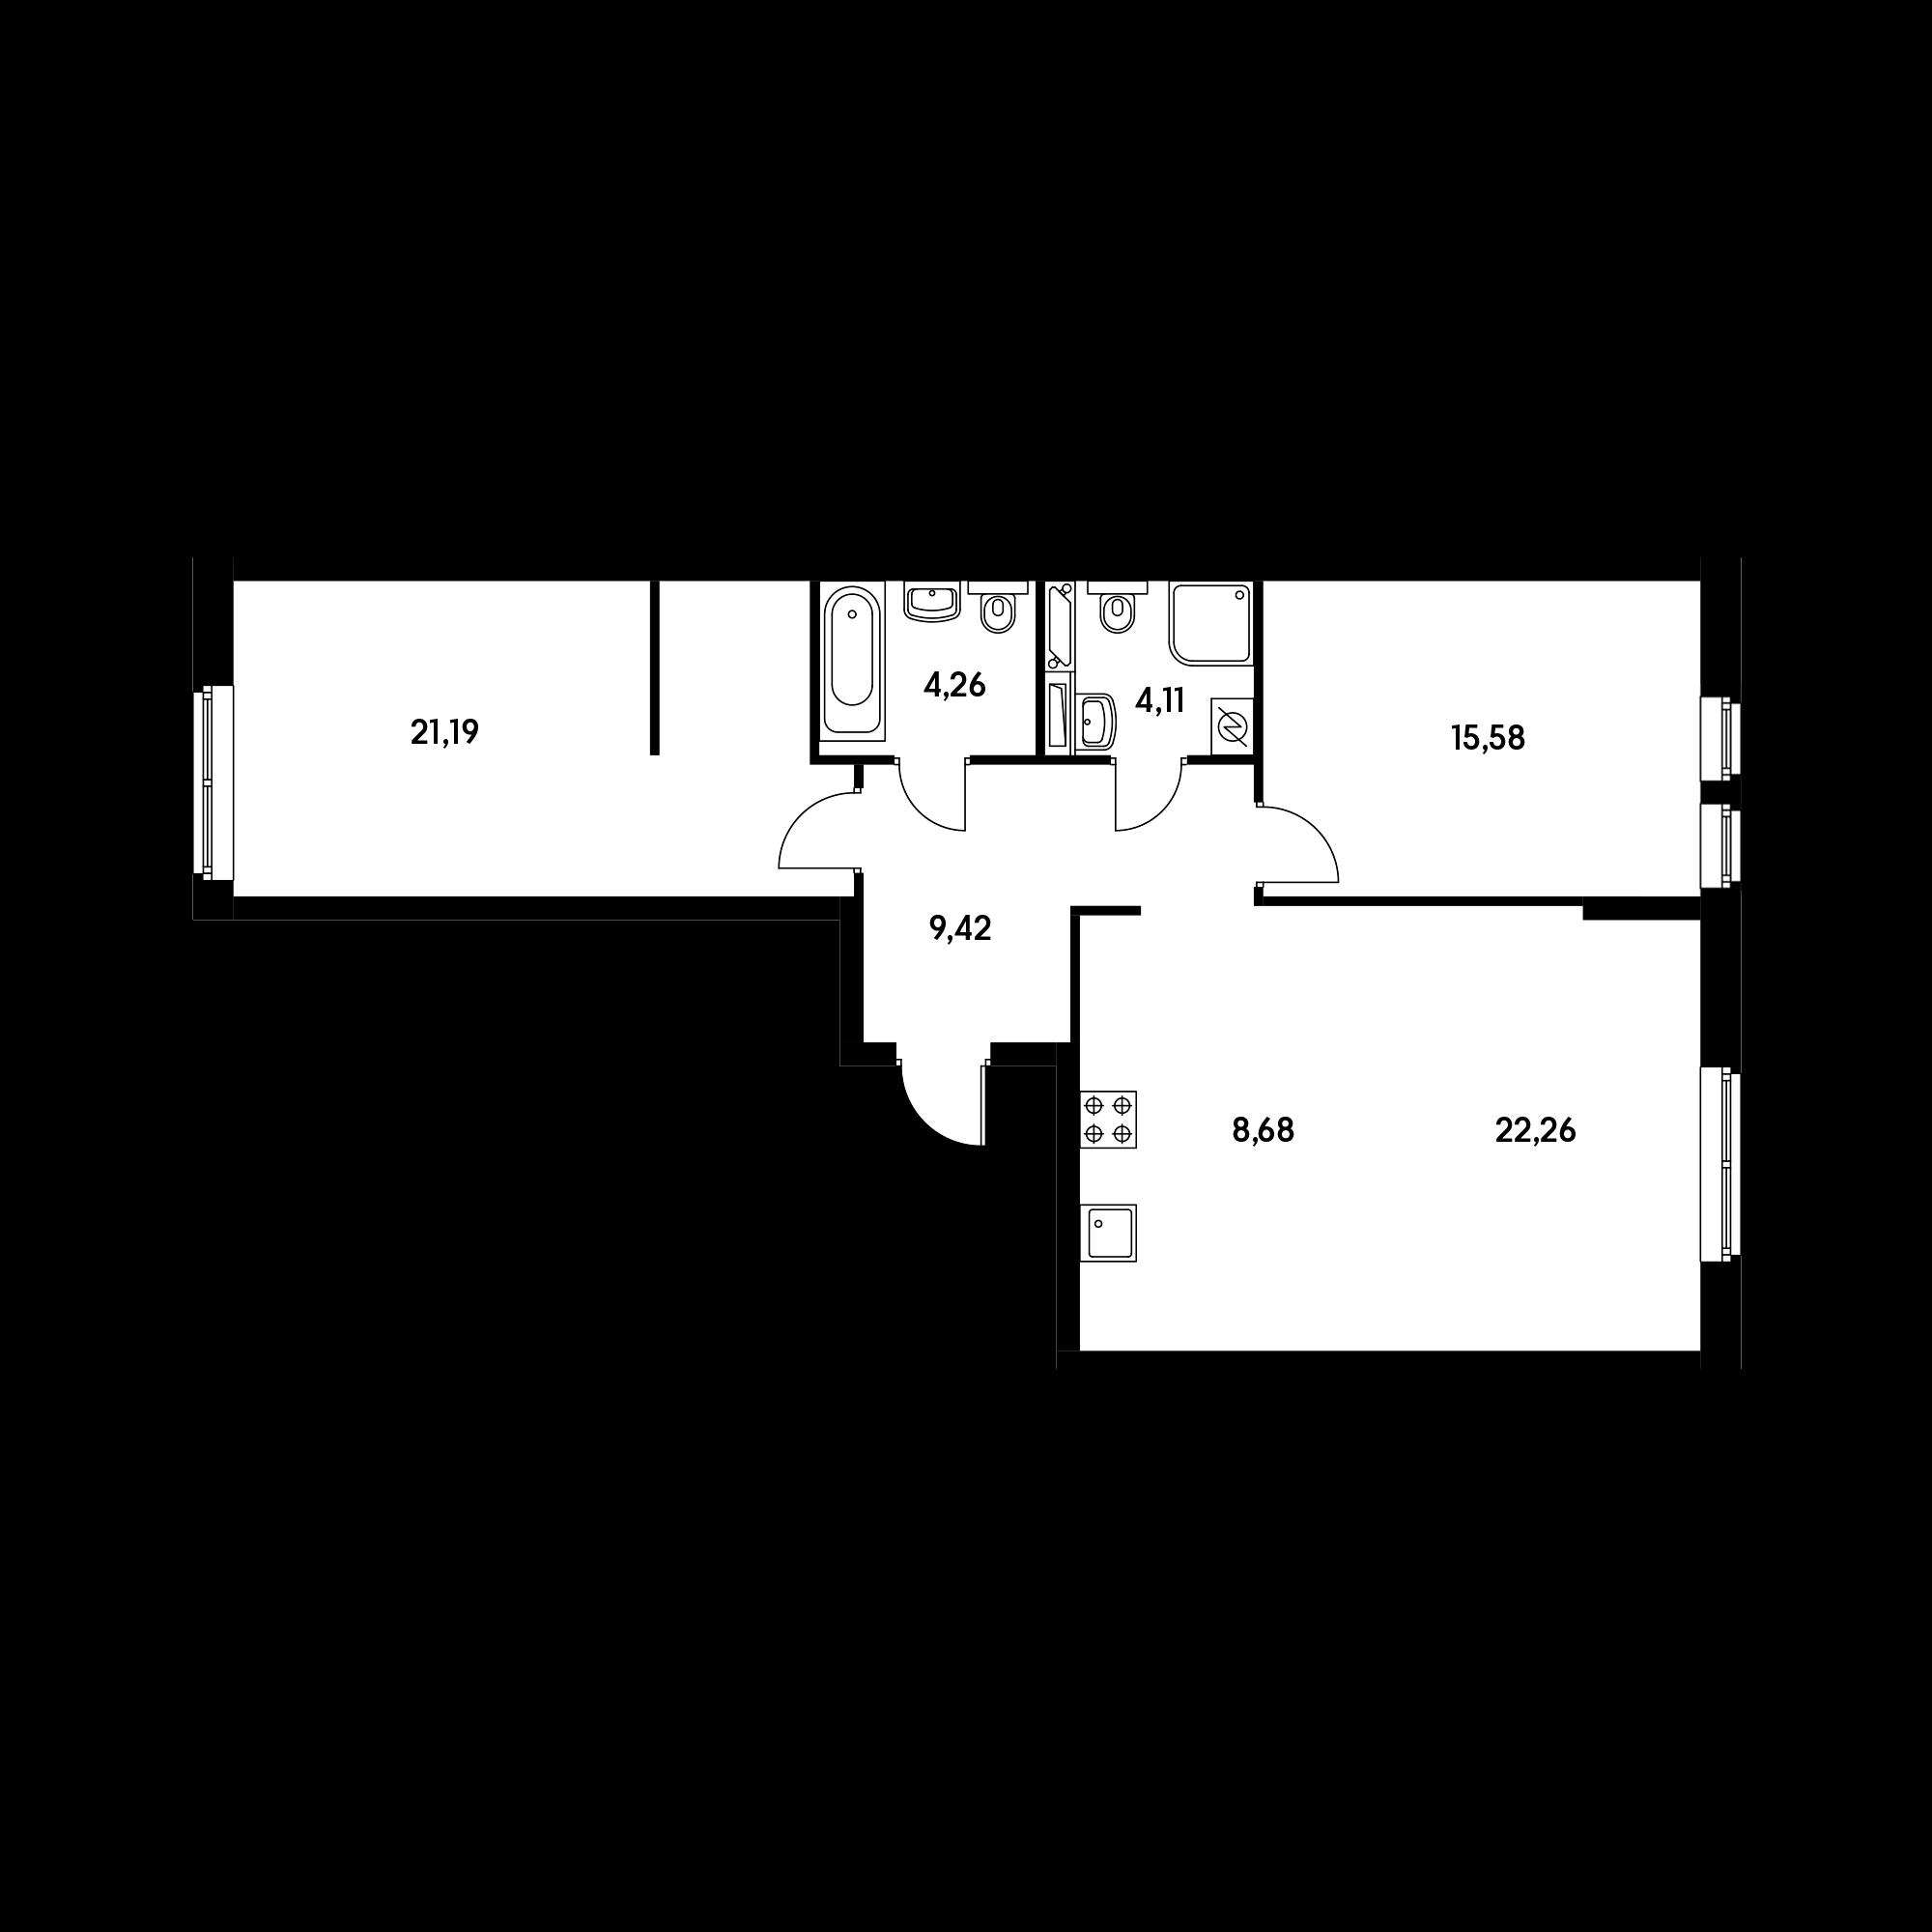 3EL18